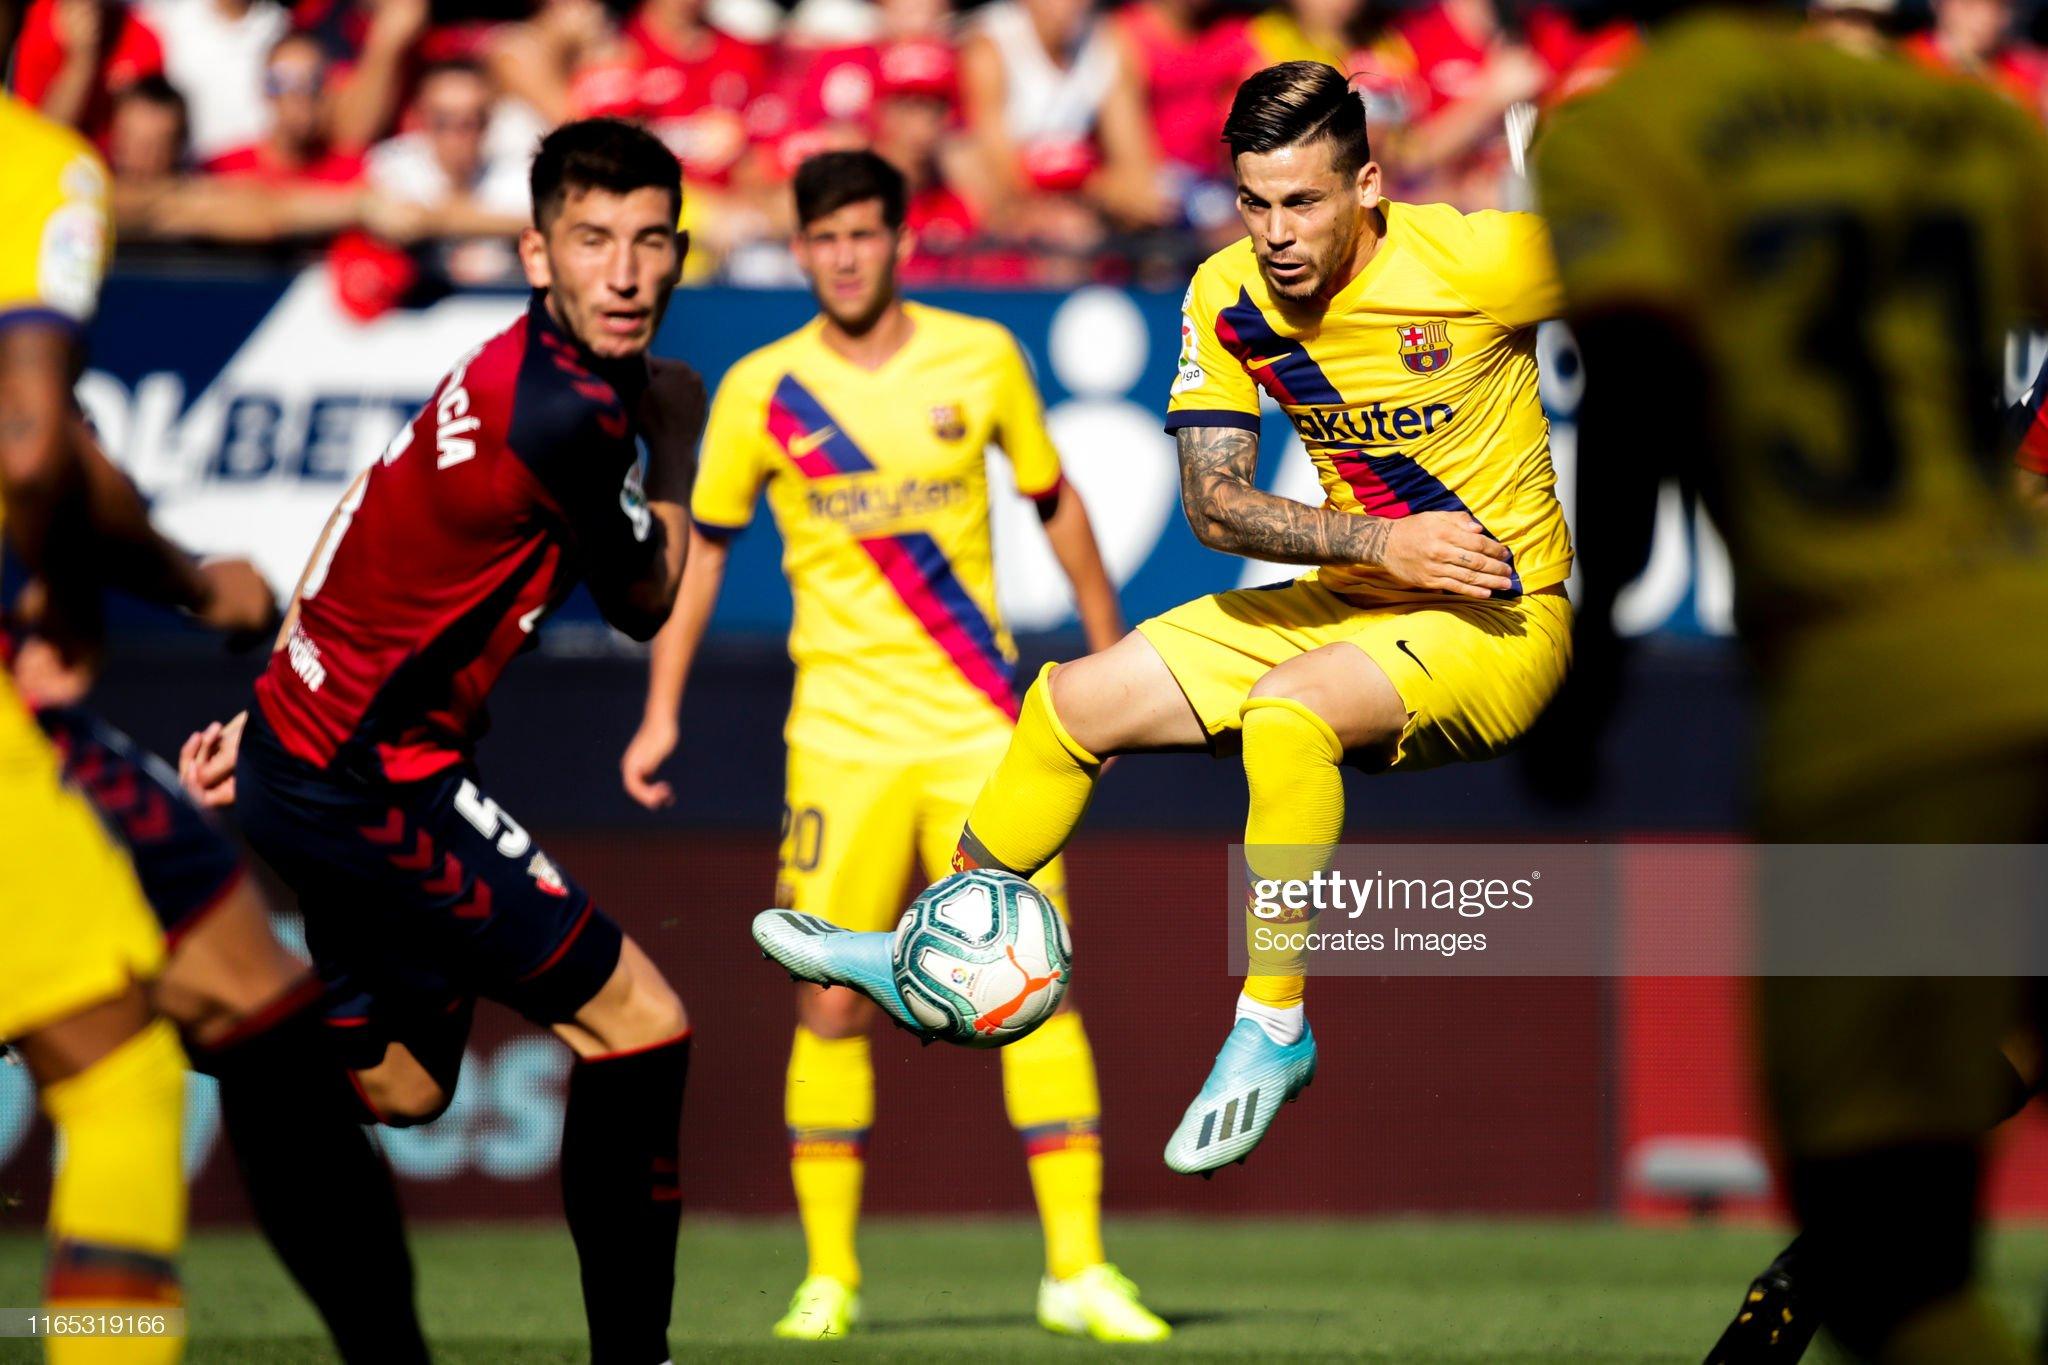 صور مباراة : أوساسونا - برشلونة 2-2 ( 31-08-2019 )  Carles-perez-of-fc-barcelona-during-the-la-liga-santander-match-v-picture-id1165319166?s=2048x2048